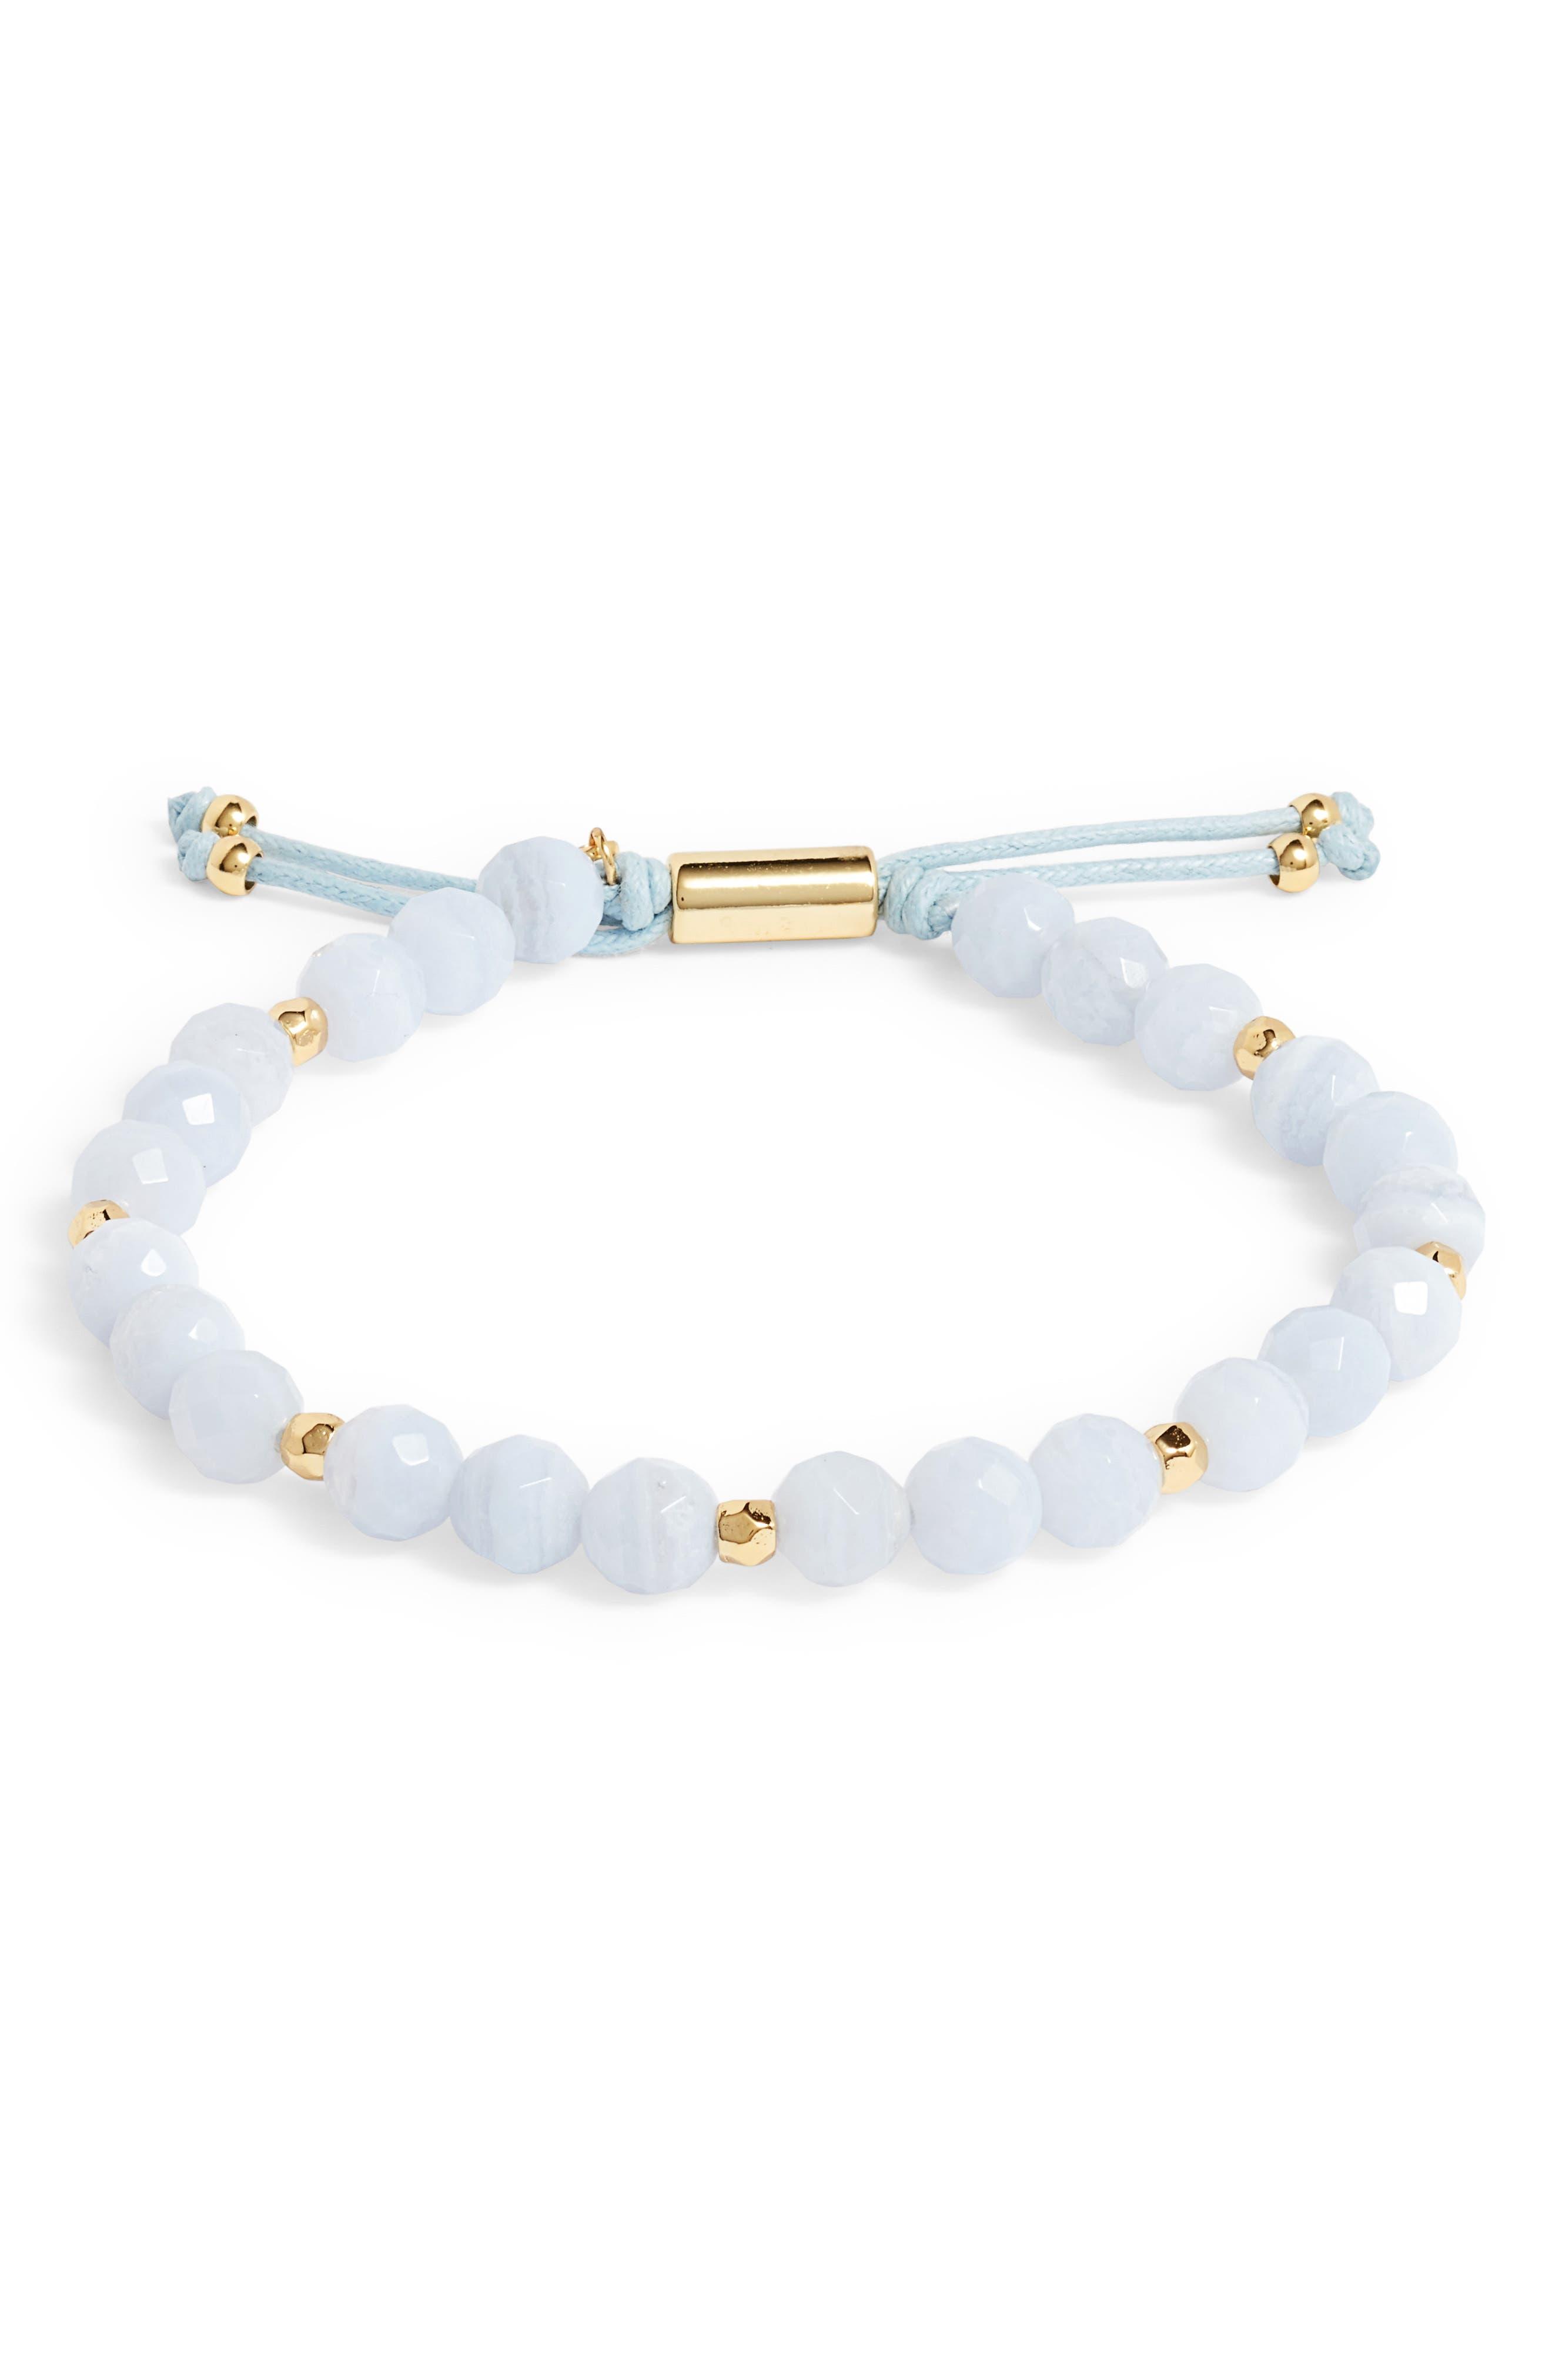 Power Gemstone Beaded Bracelet,                         Main,                         color, Blue Lace Agate/ Gold